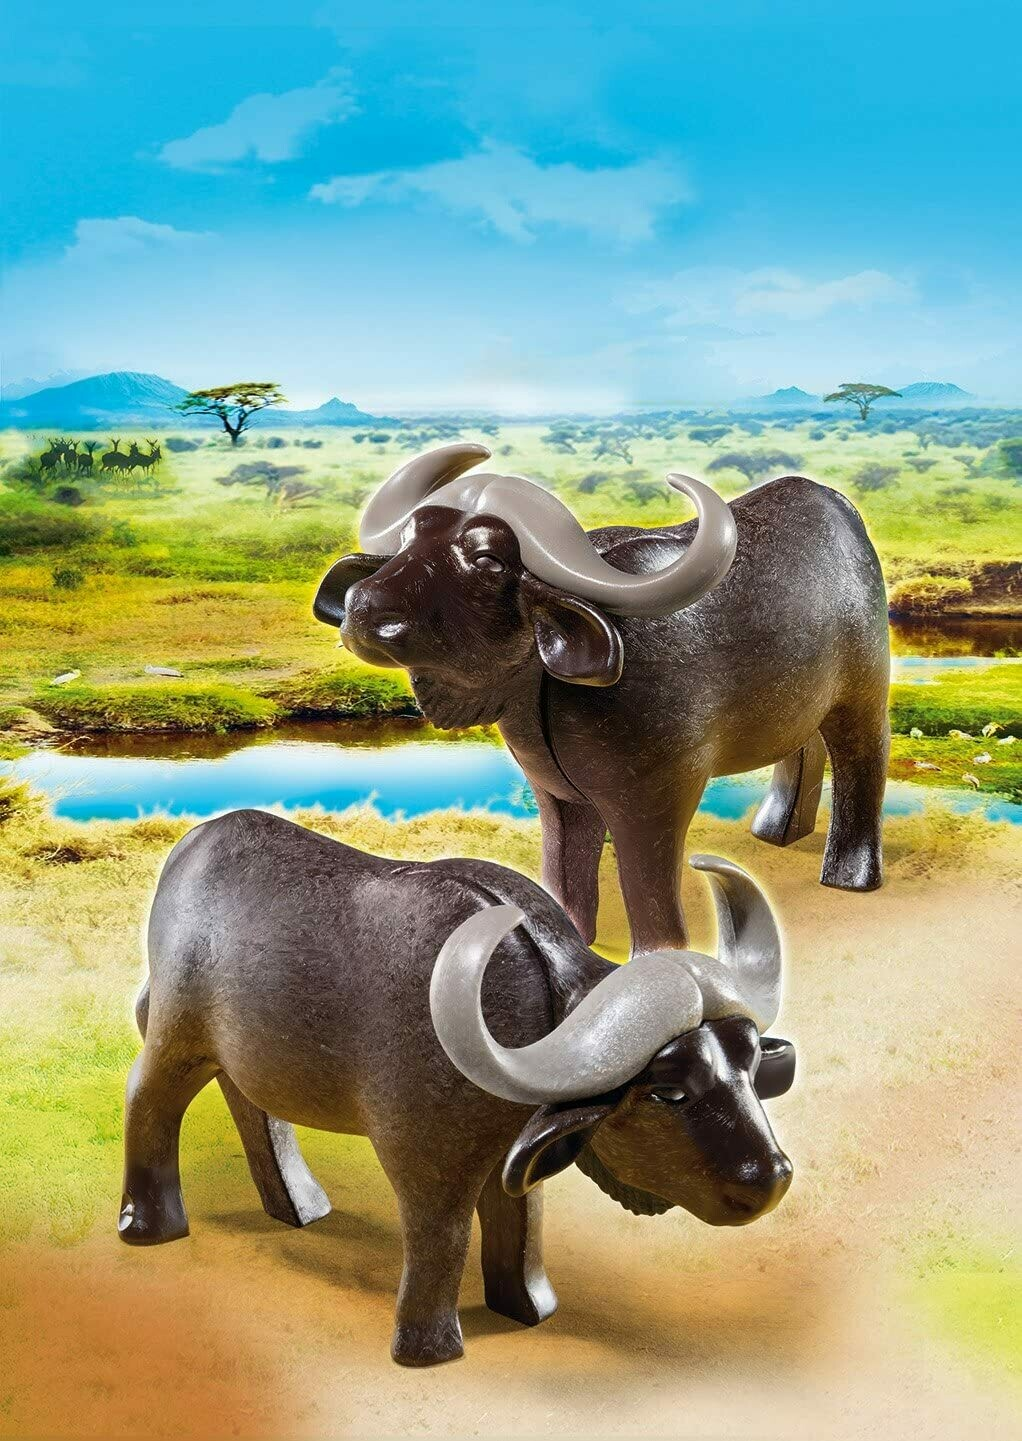 Playmobil; Water Buffaloes